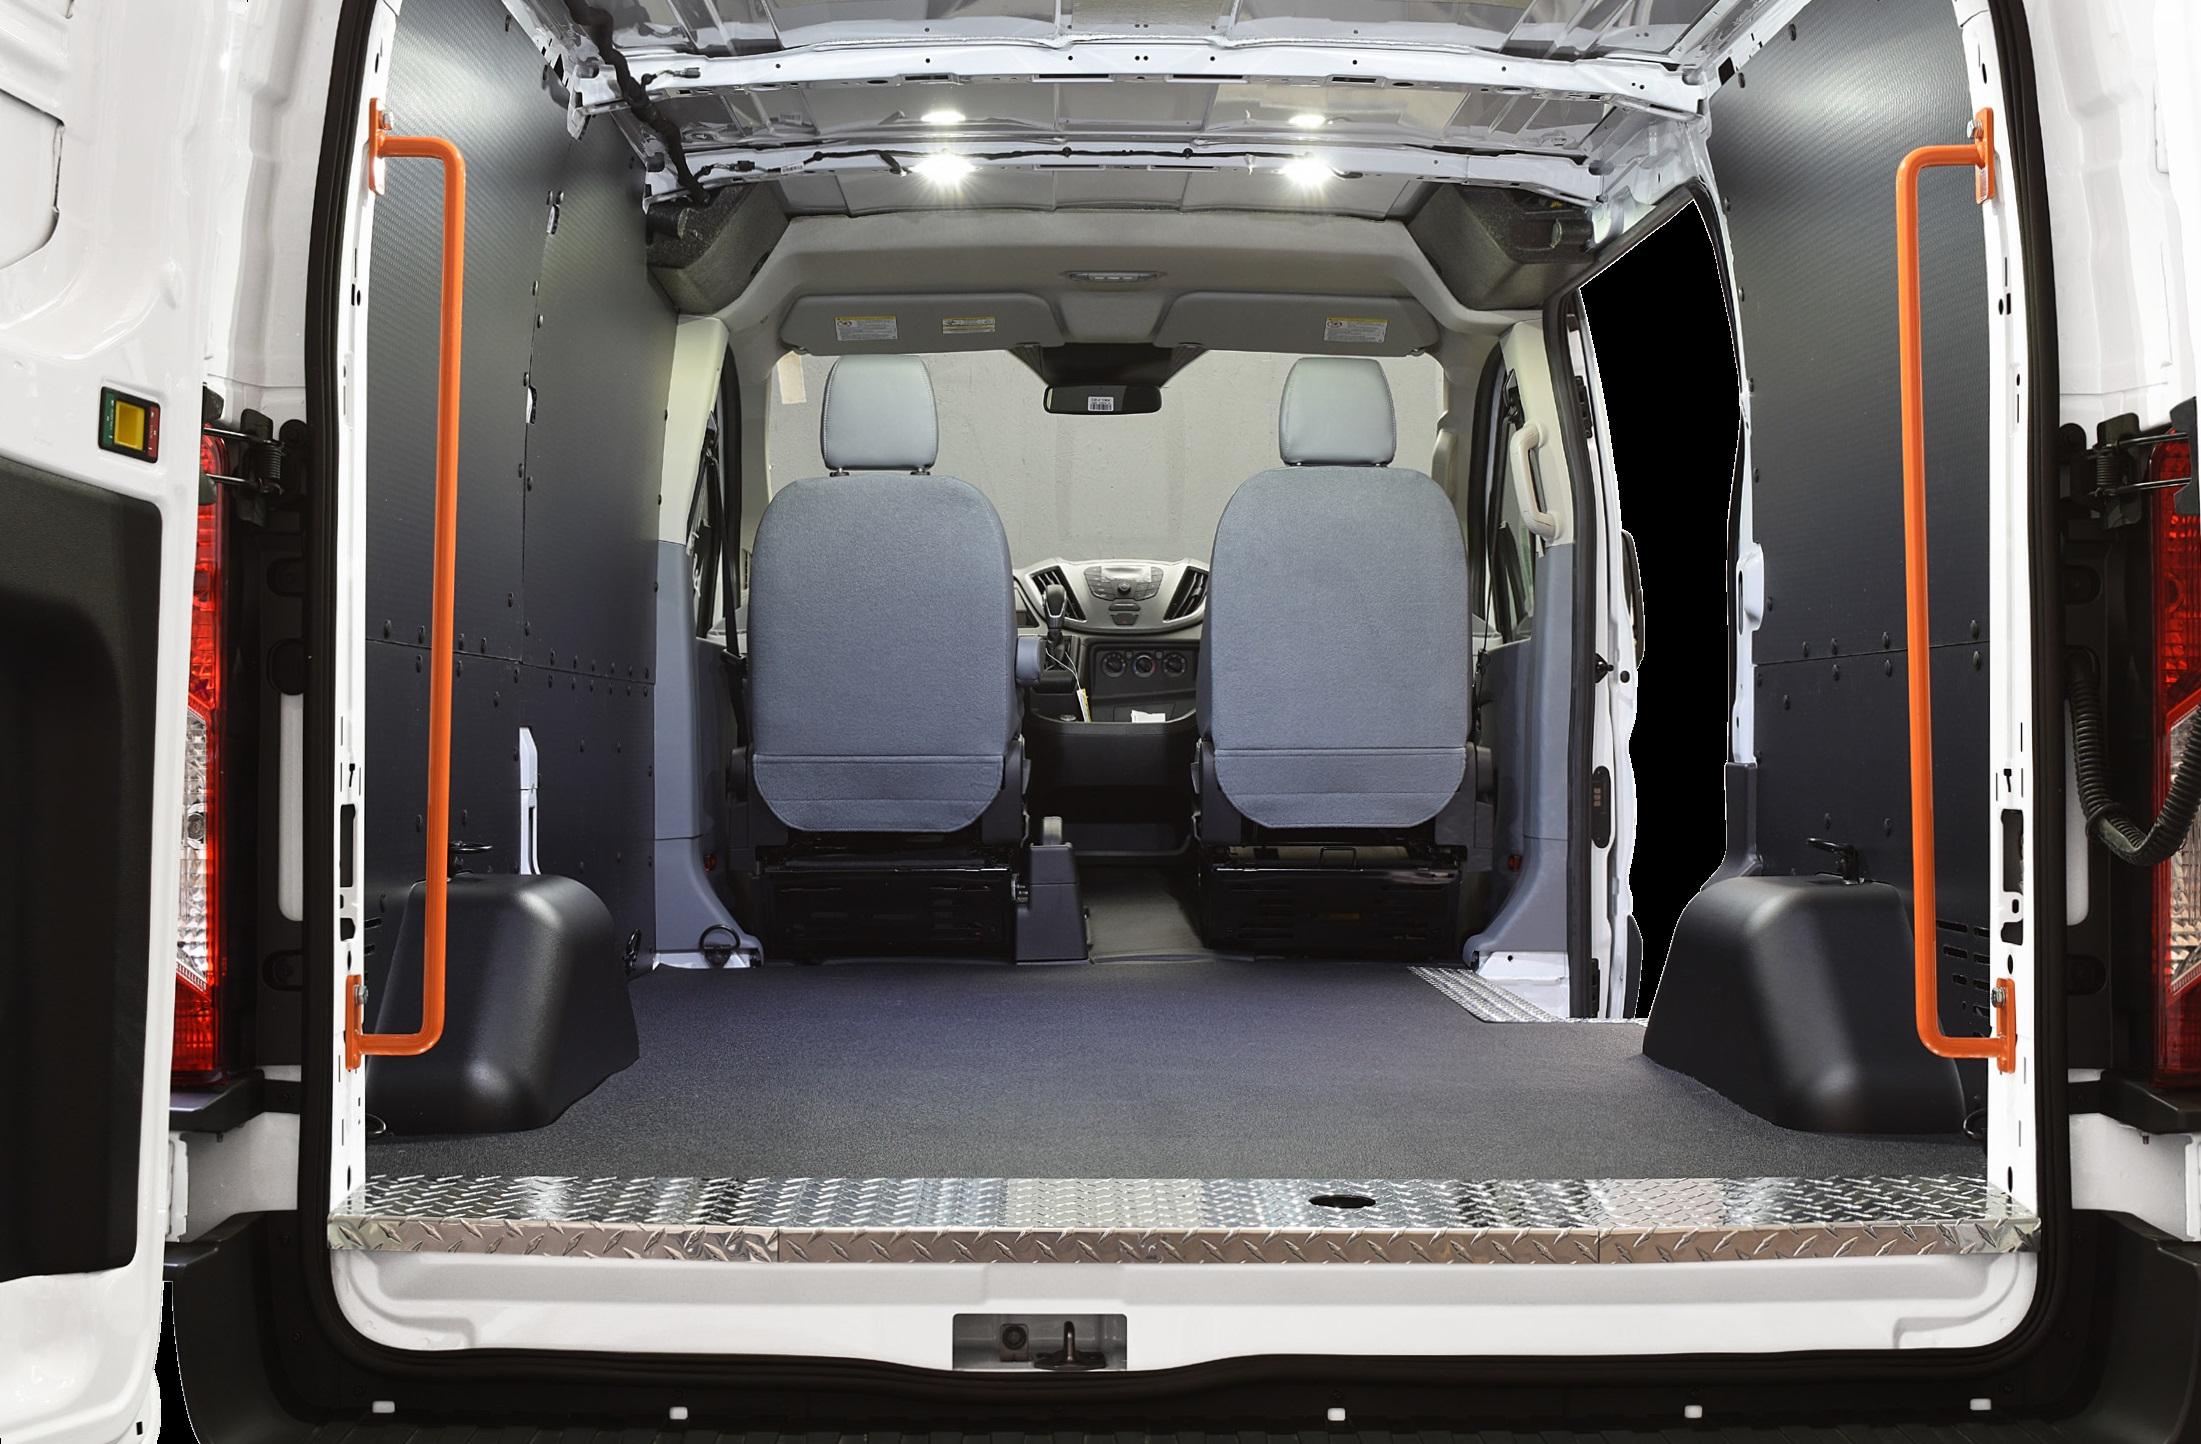 Ford Transit Rear Door Safety Grab Handles